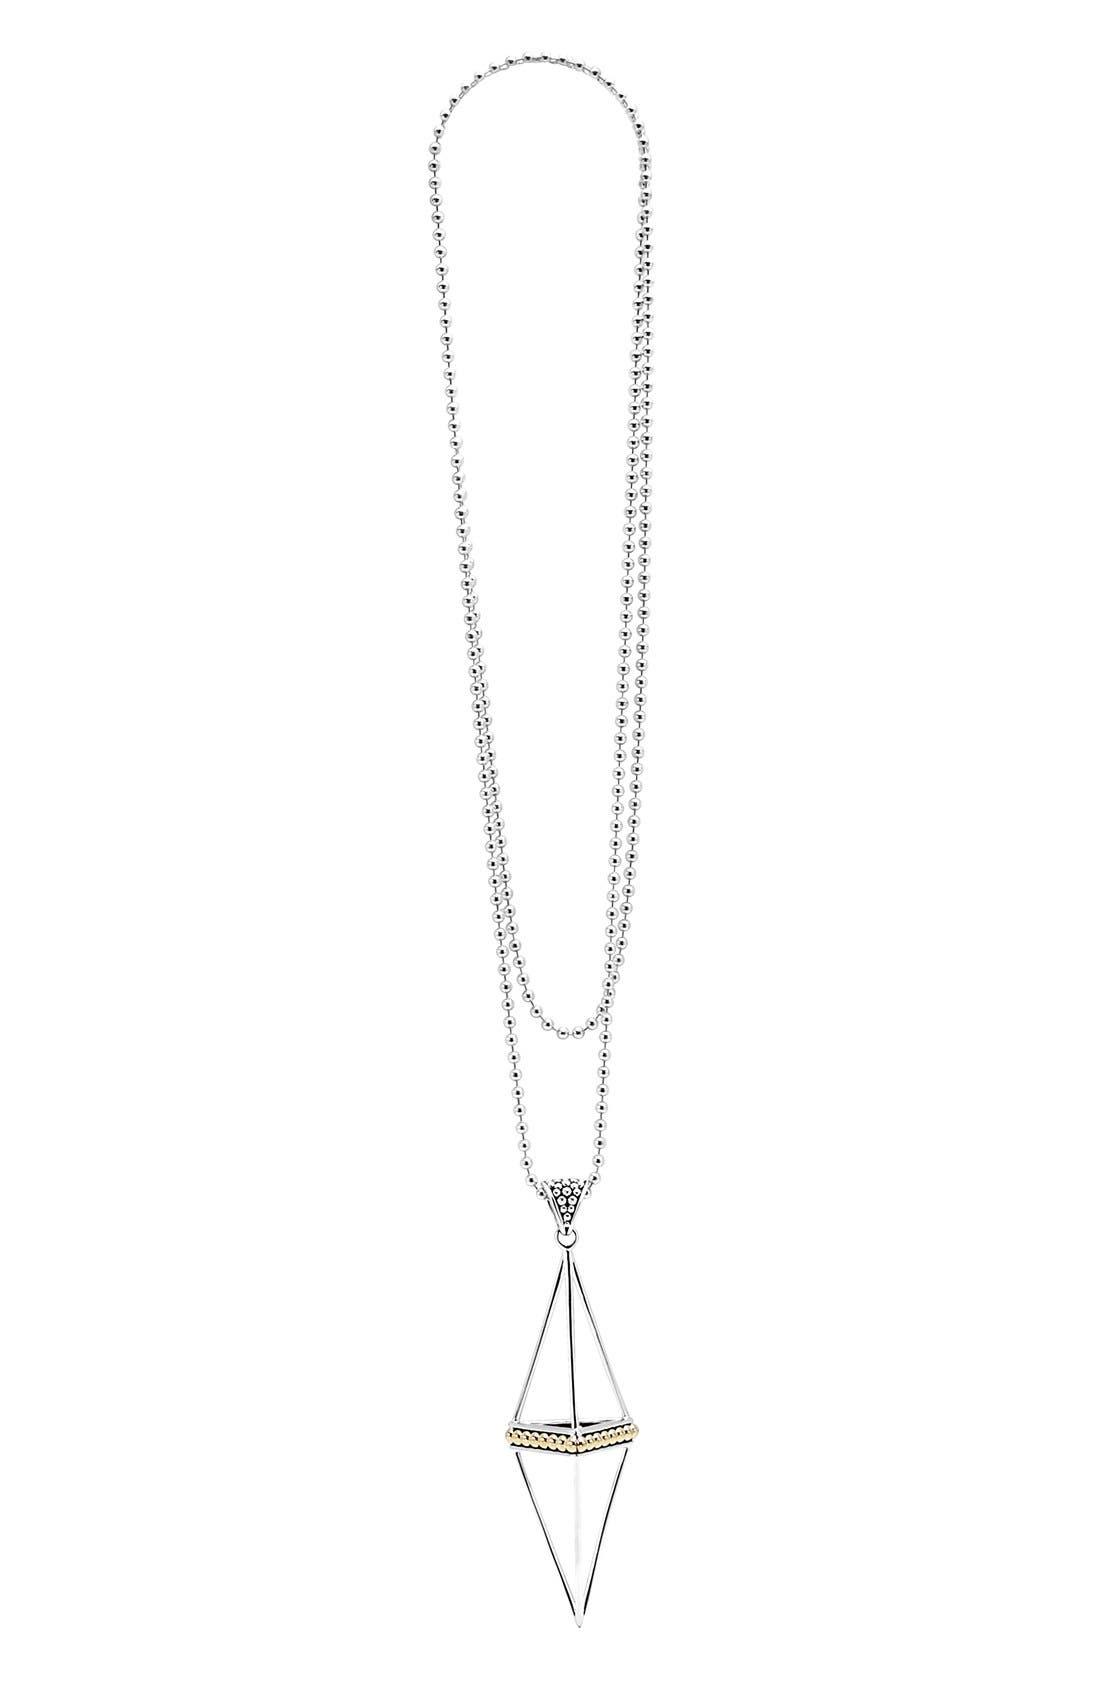 'KSl' Pyramid Pendant Necklace,                         Main,                         color, Silver/ Gold